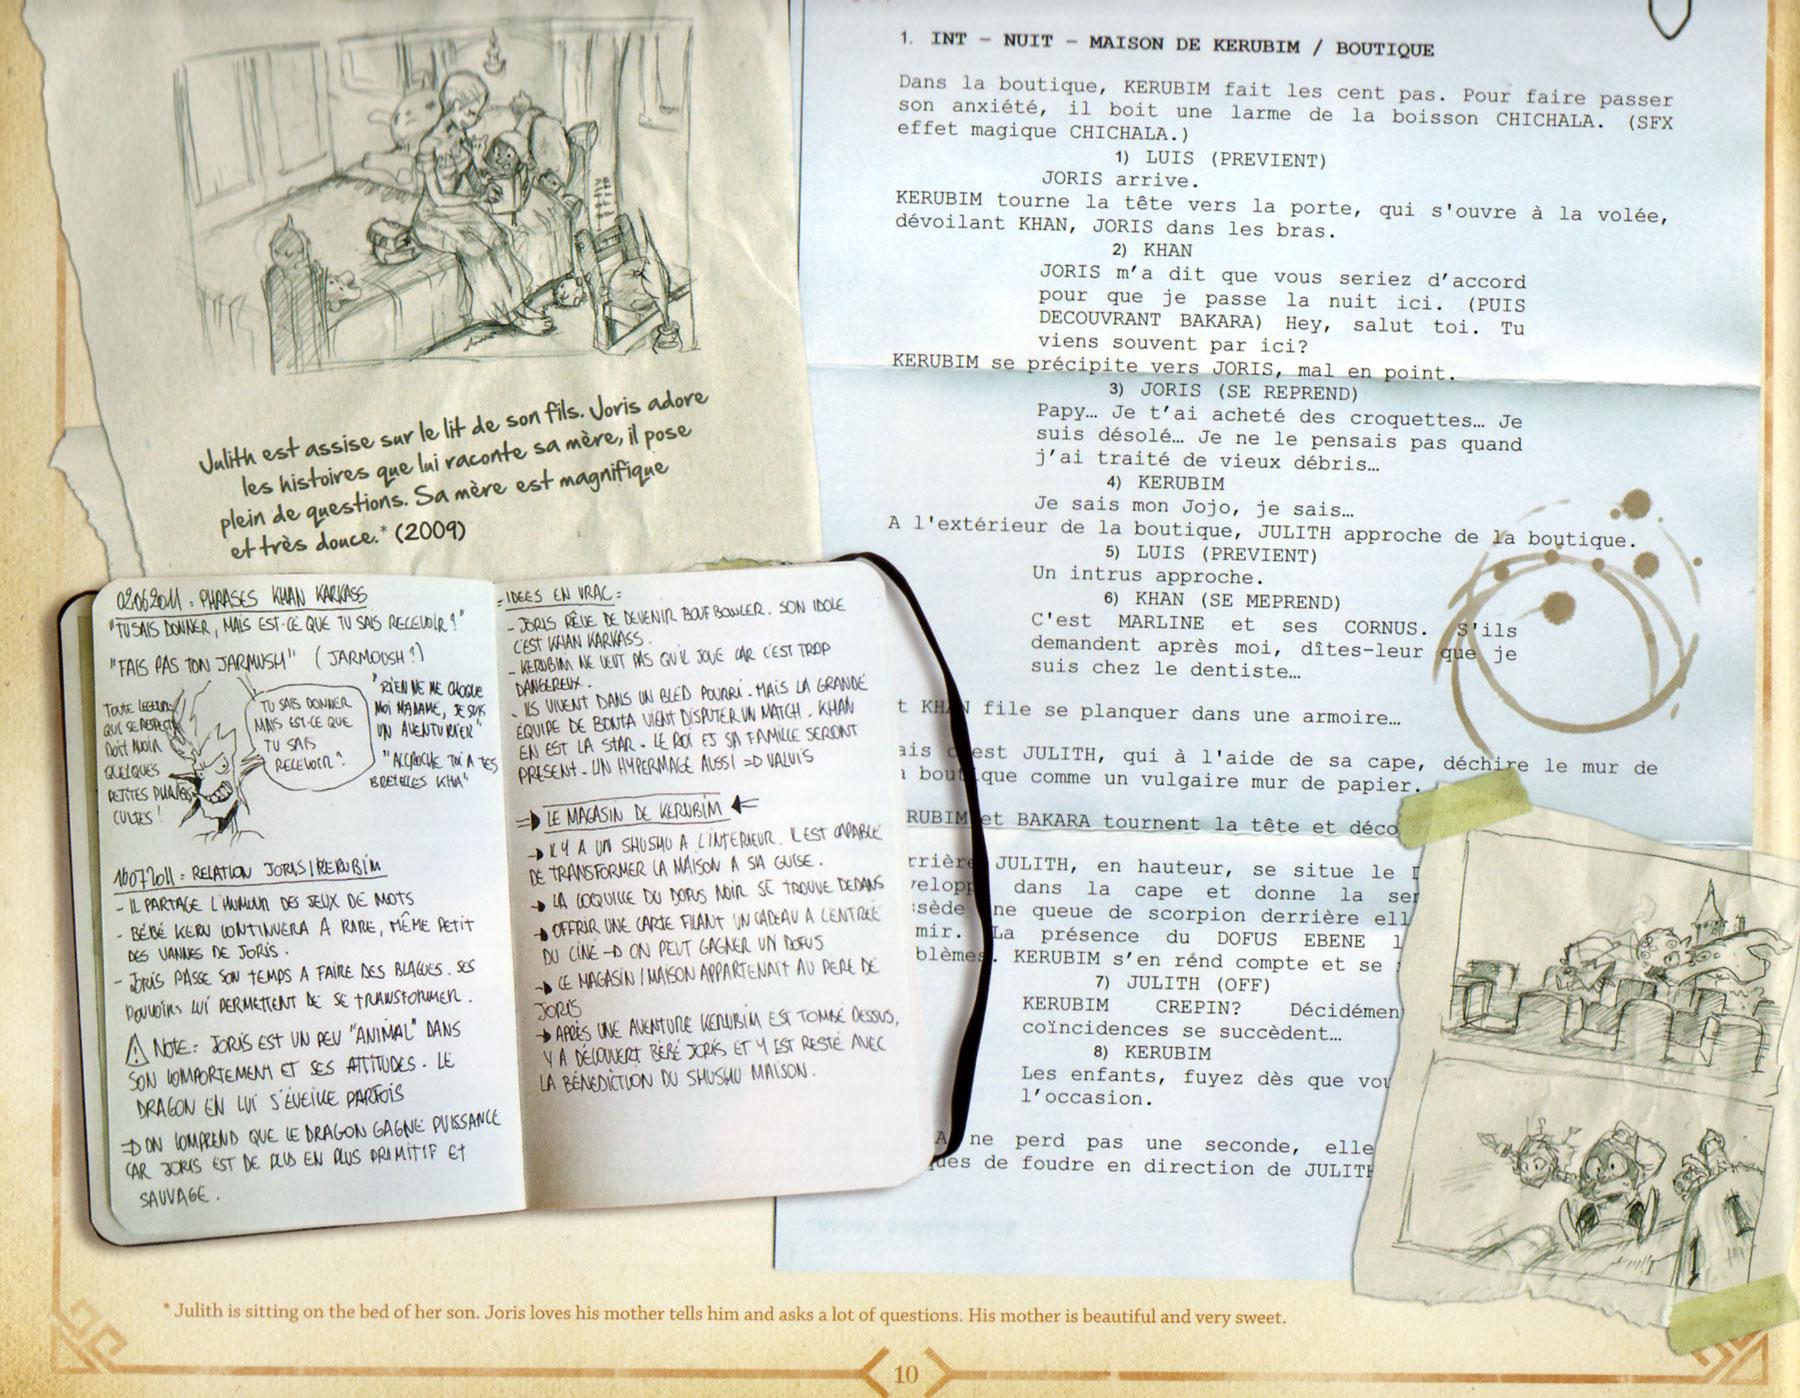 the art of dofus livre 1 julith ankama page 10